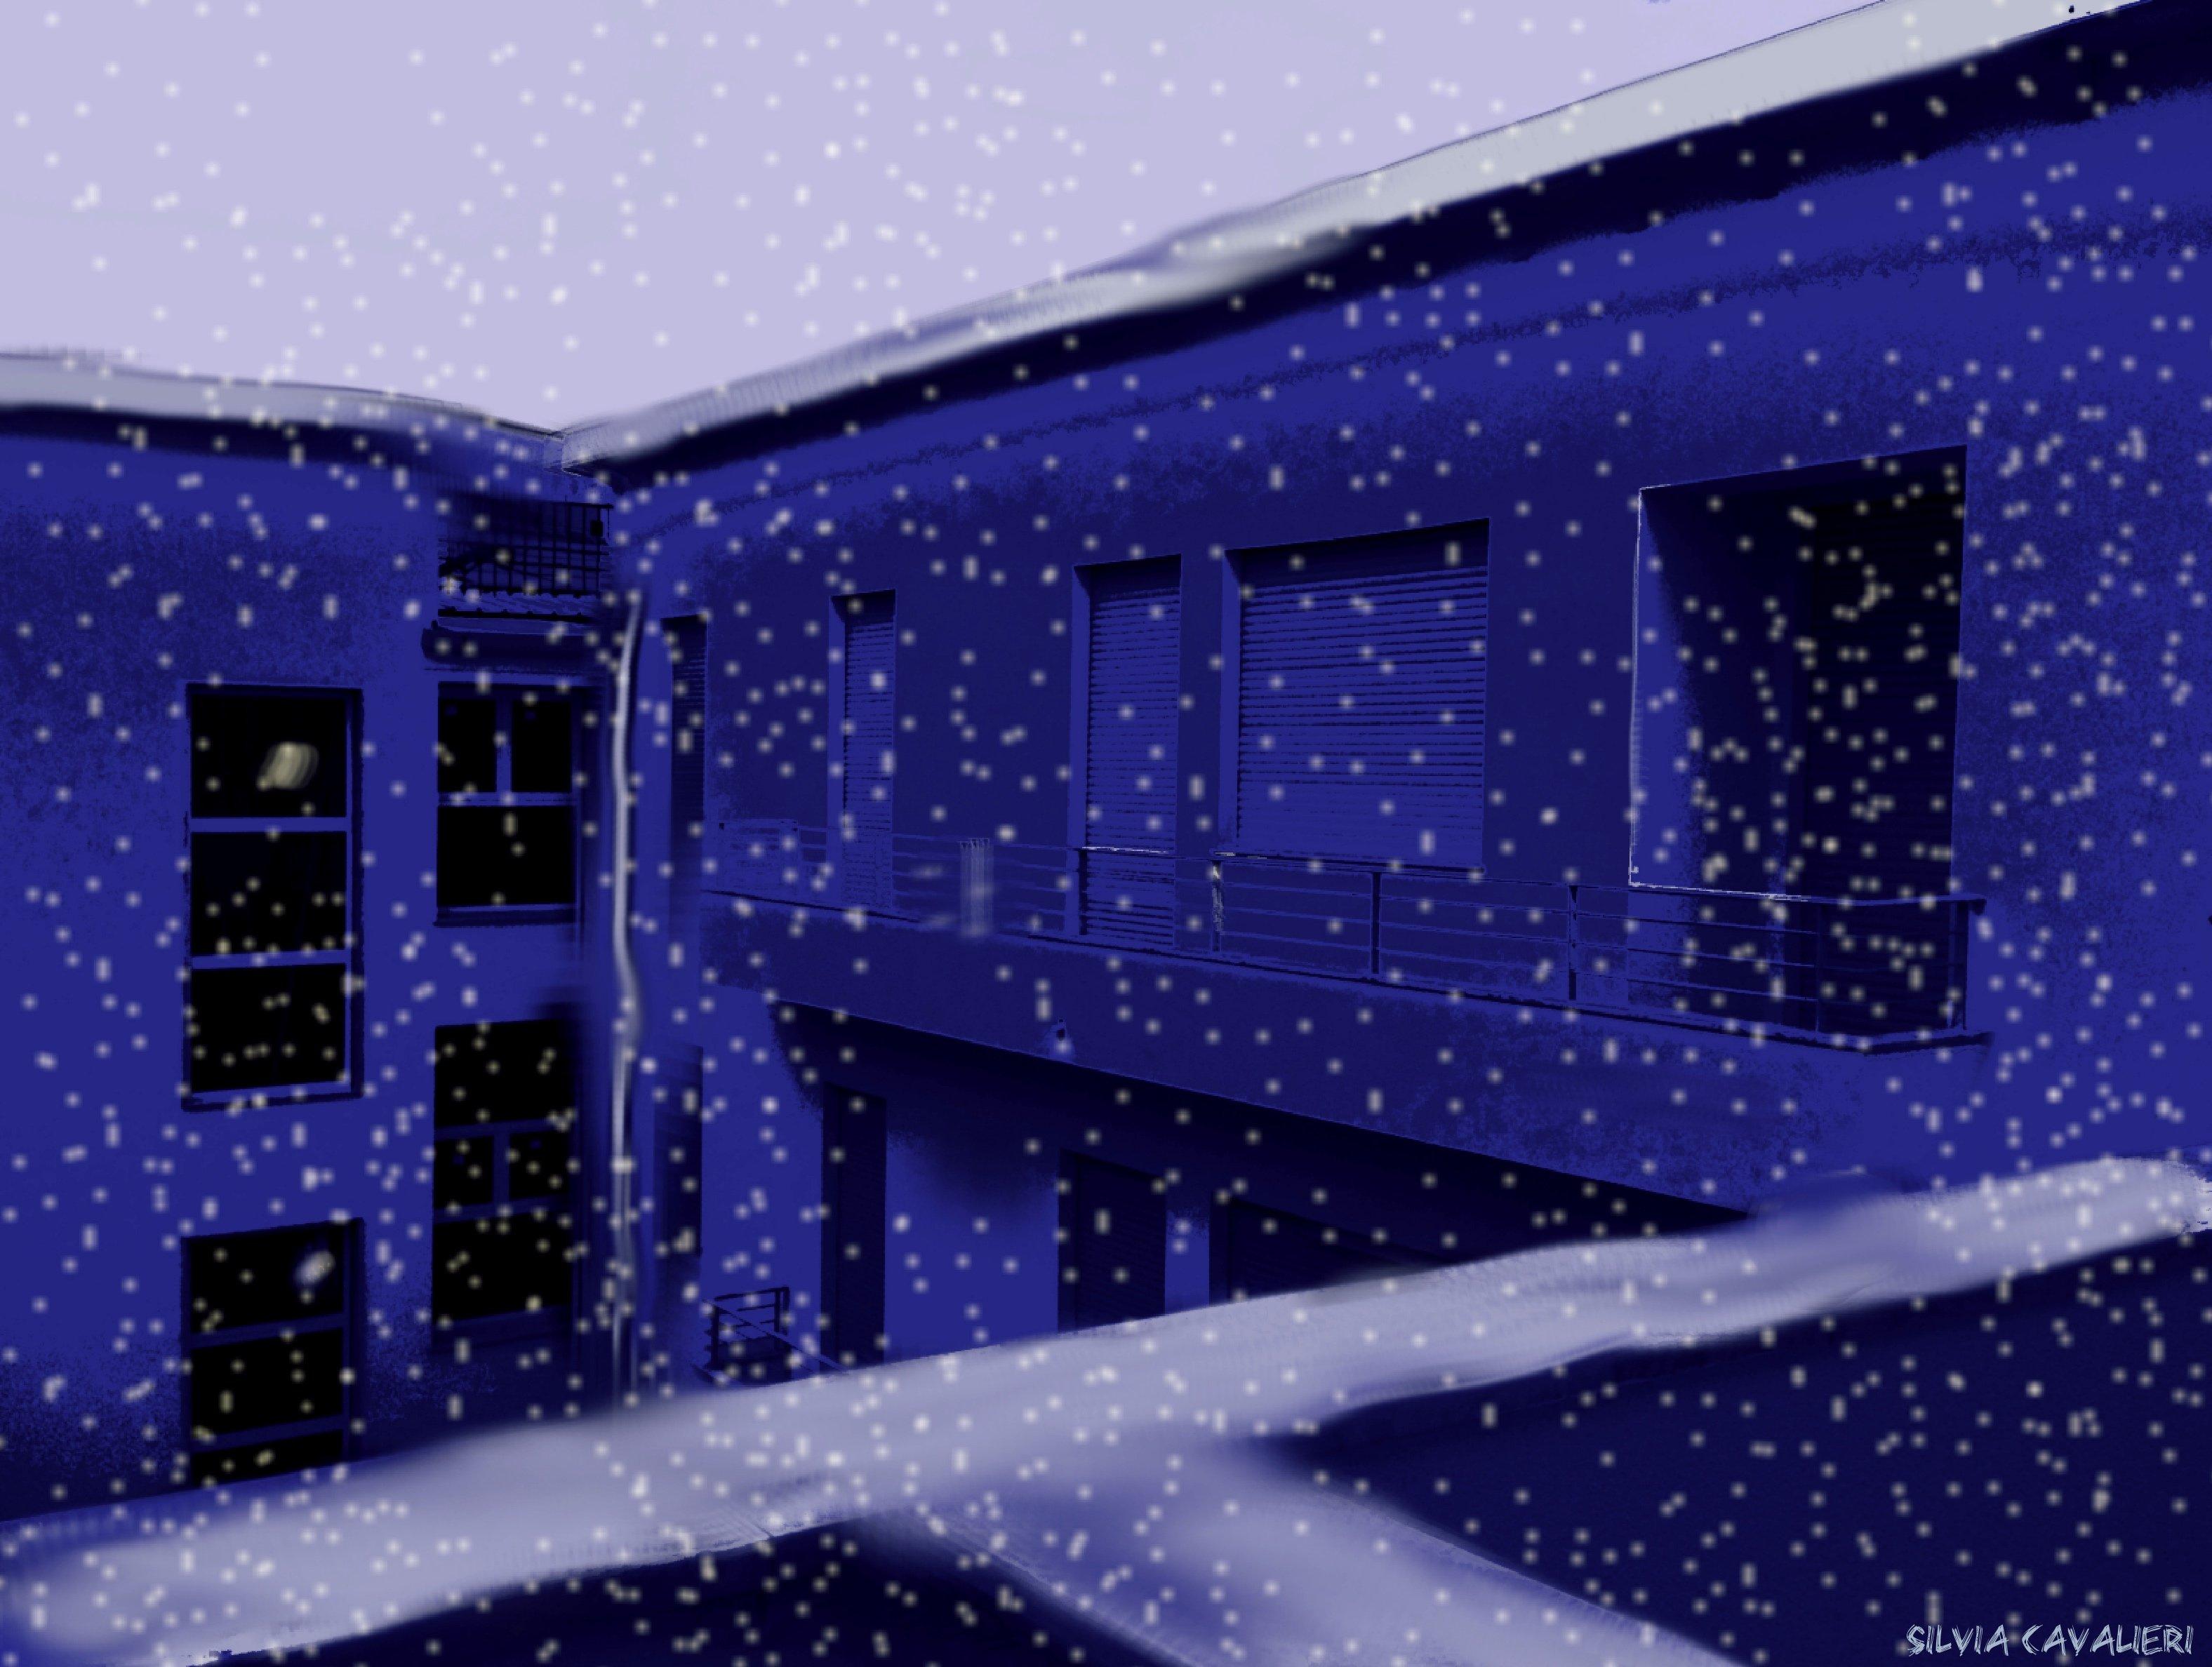 come nevica